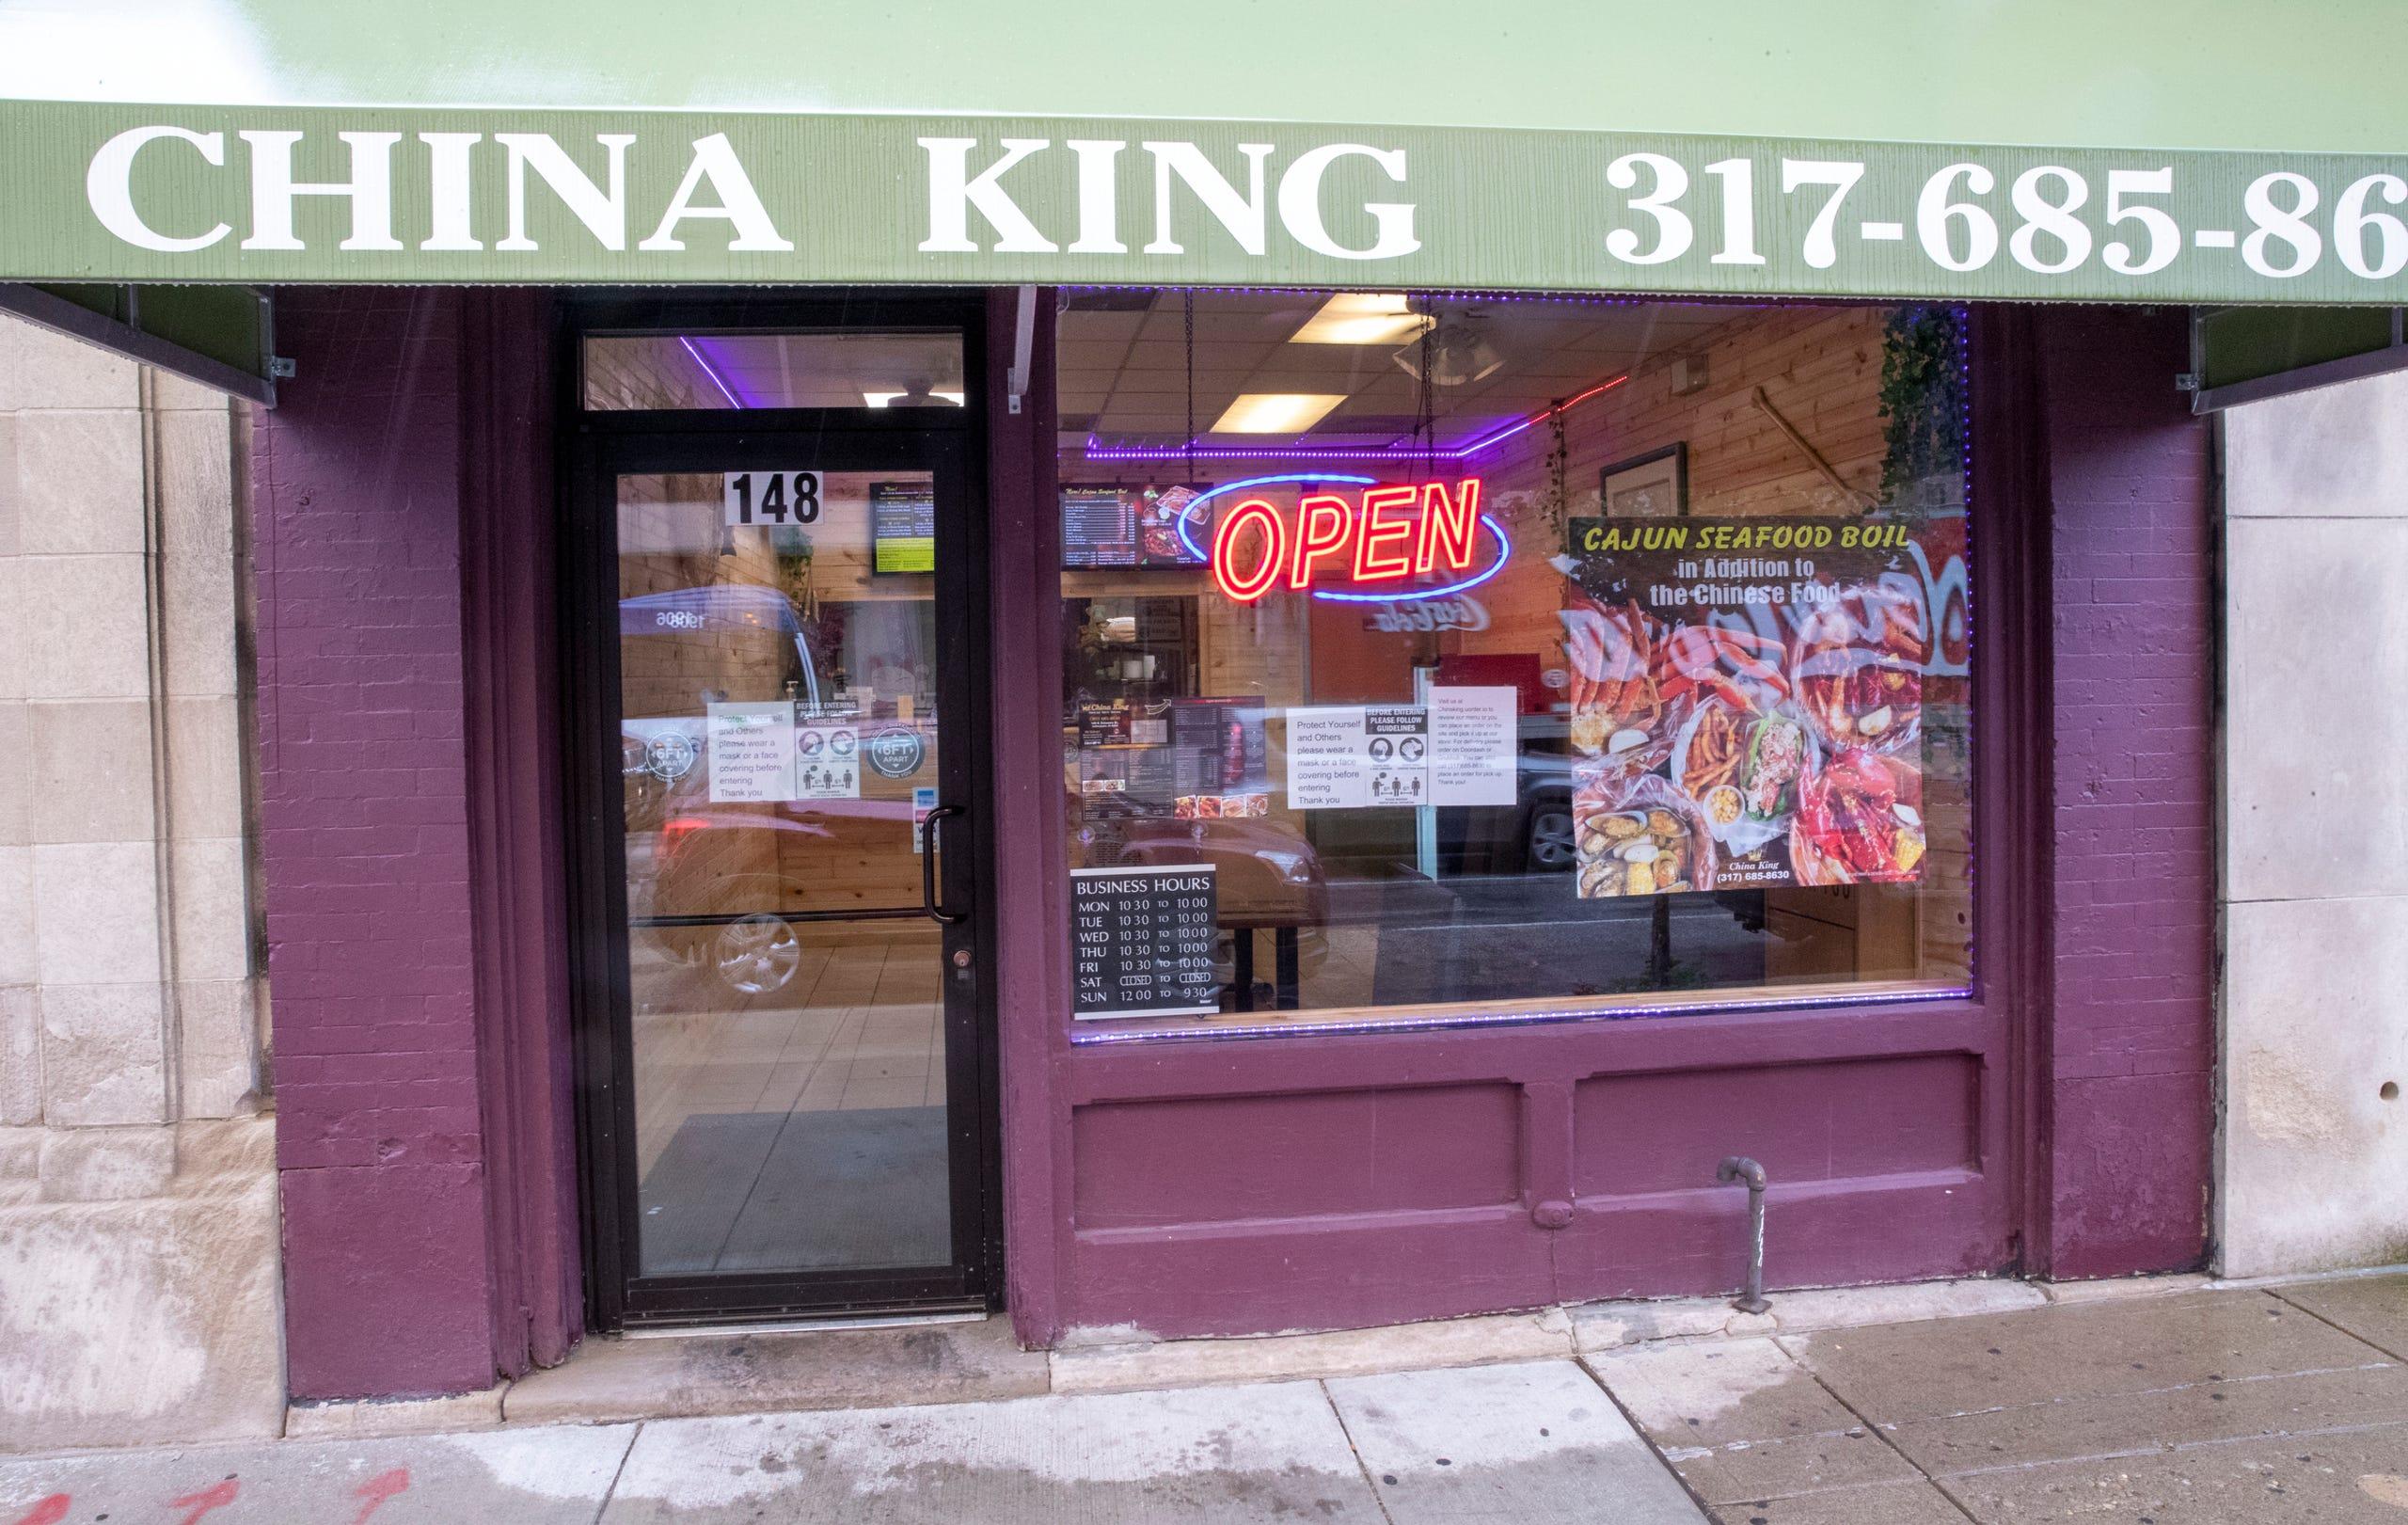 China King Expands Its Menu Adding Cajun Seafood To Chinese Favorites